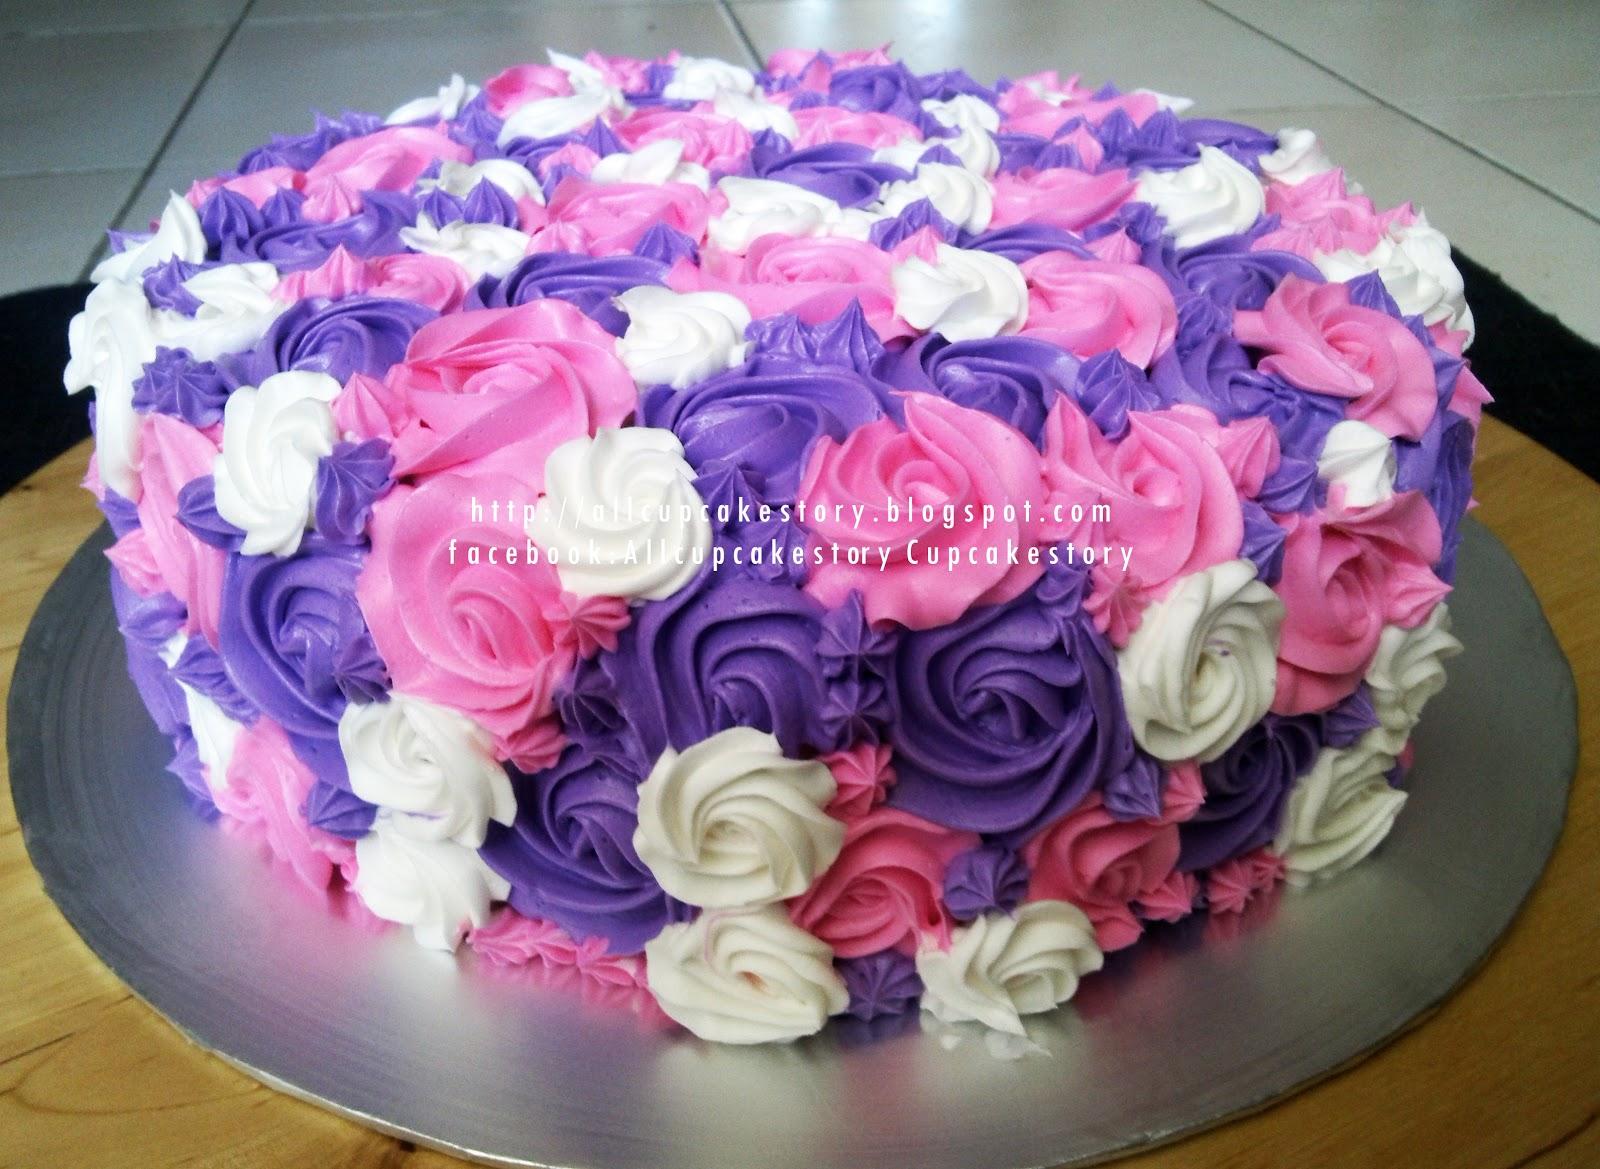 allcupcakestory: Purple & Pink Flower Cake